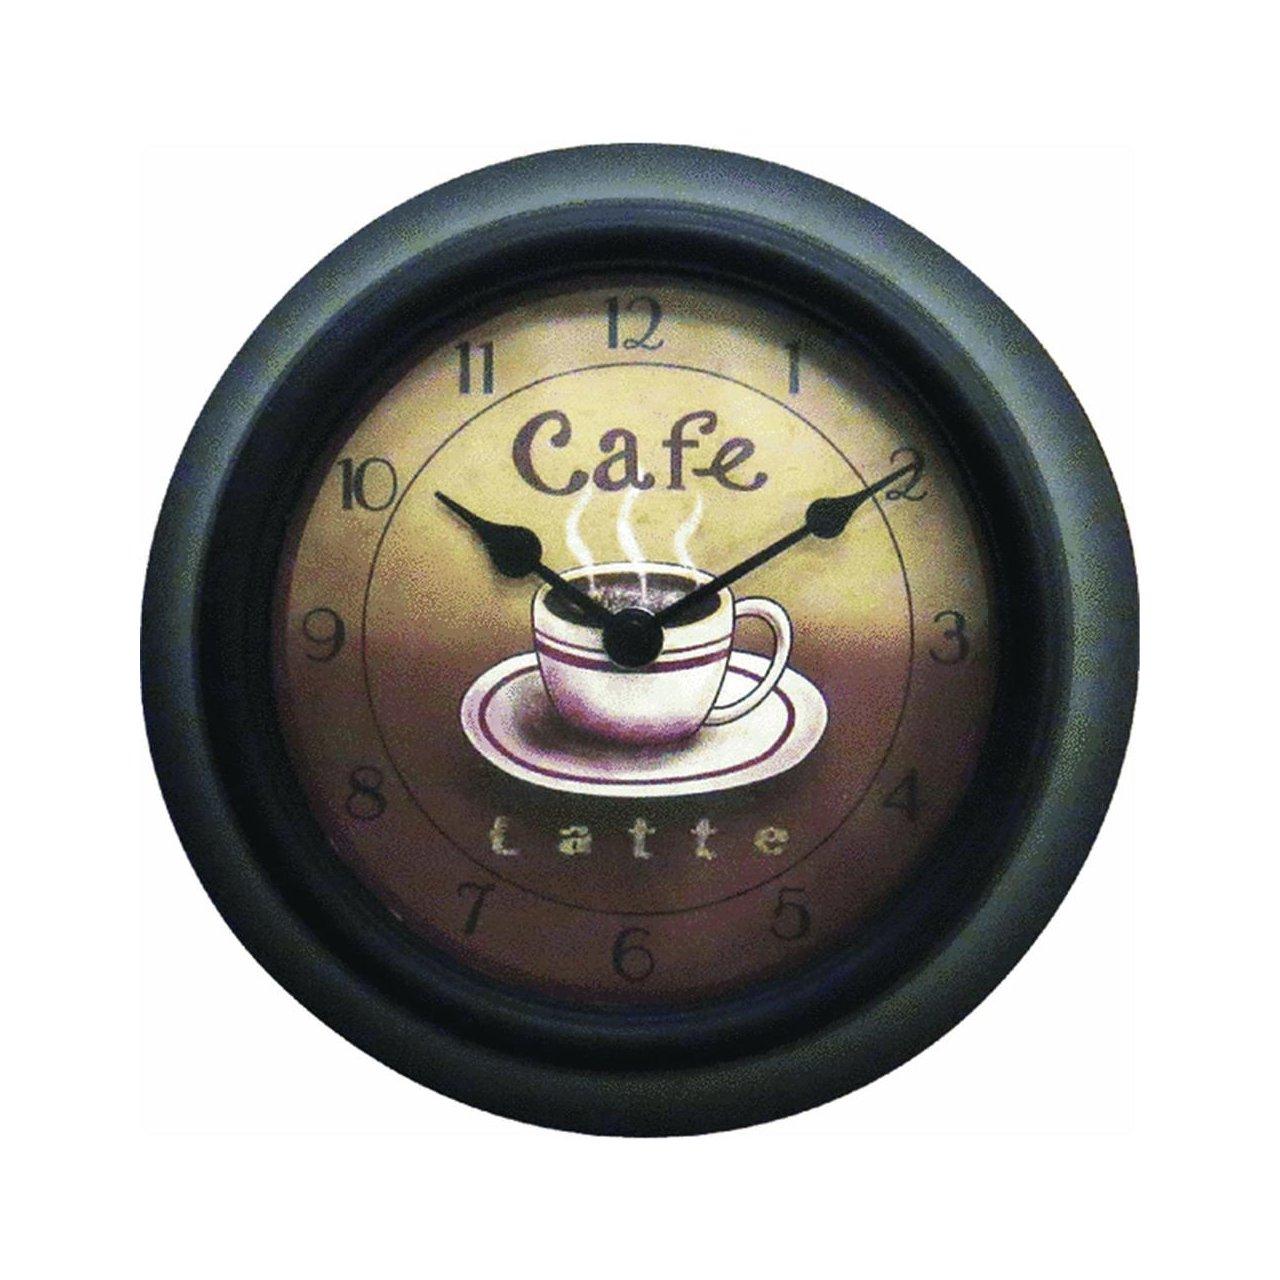 Geneva Clock Co 8125 Cafe Plastic Wall Clock 9 inch